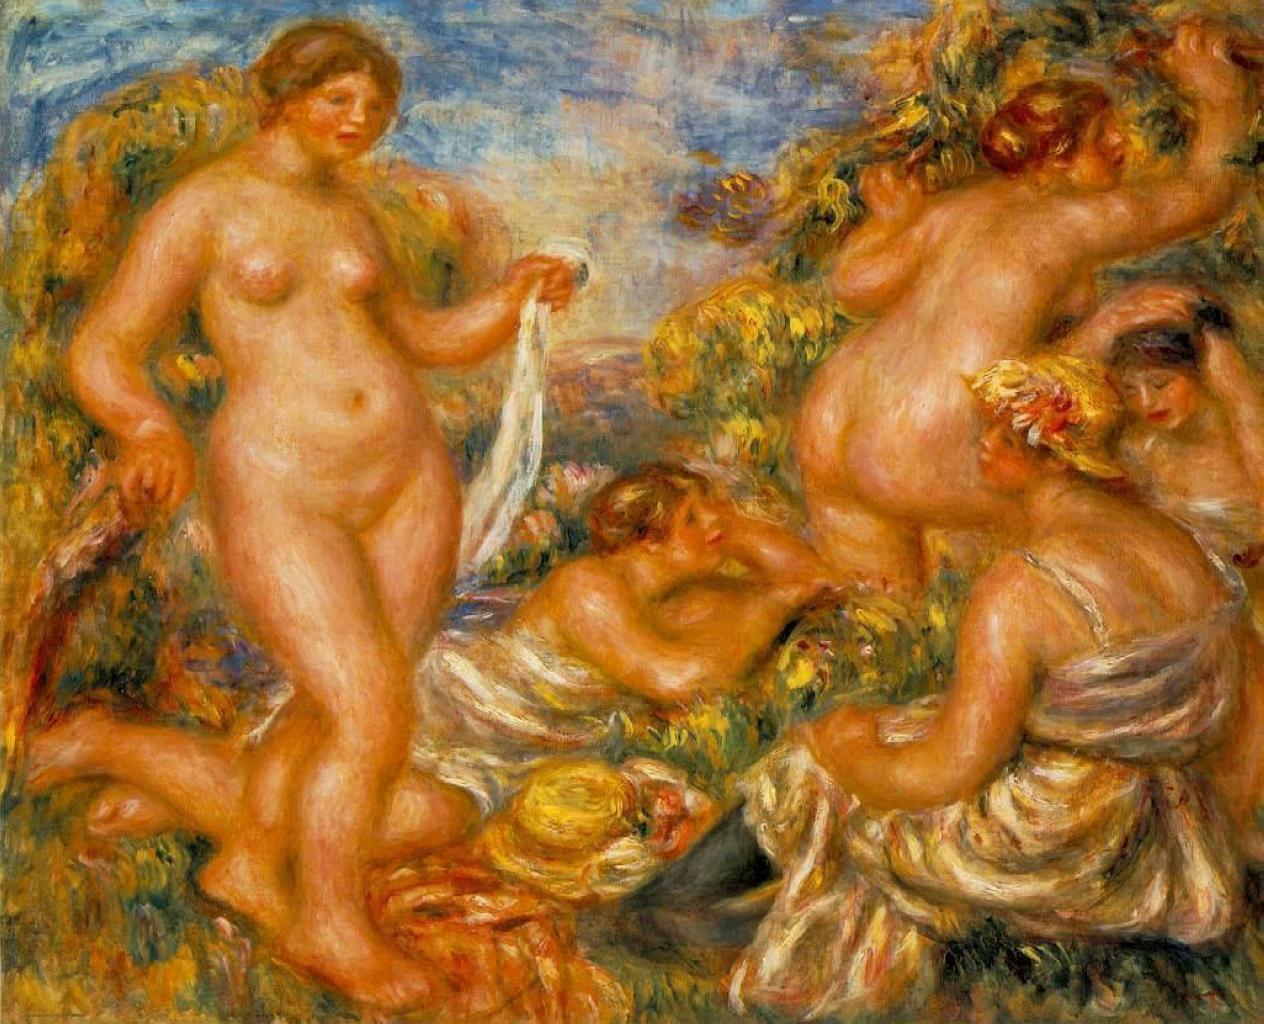 Пьер Огюст Ренуар , Пять Купальщиц 1918; 67x81см холст/масло; The Barnes Foundation, Philadelphia, US